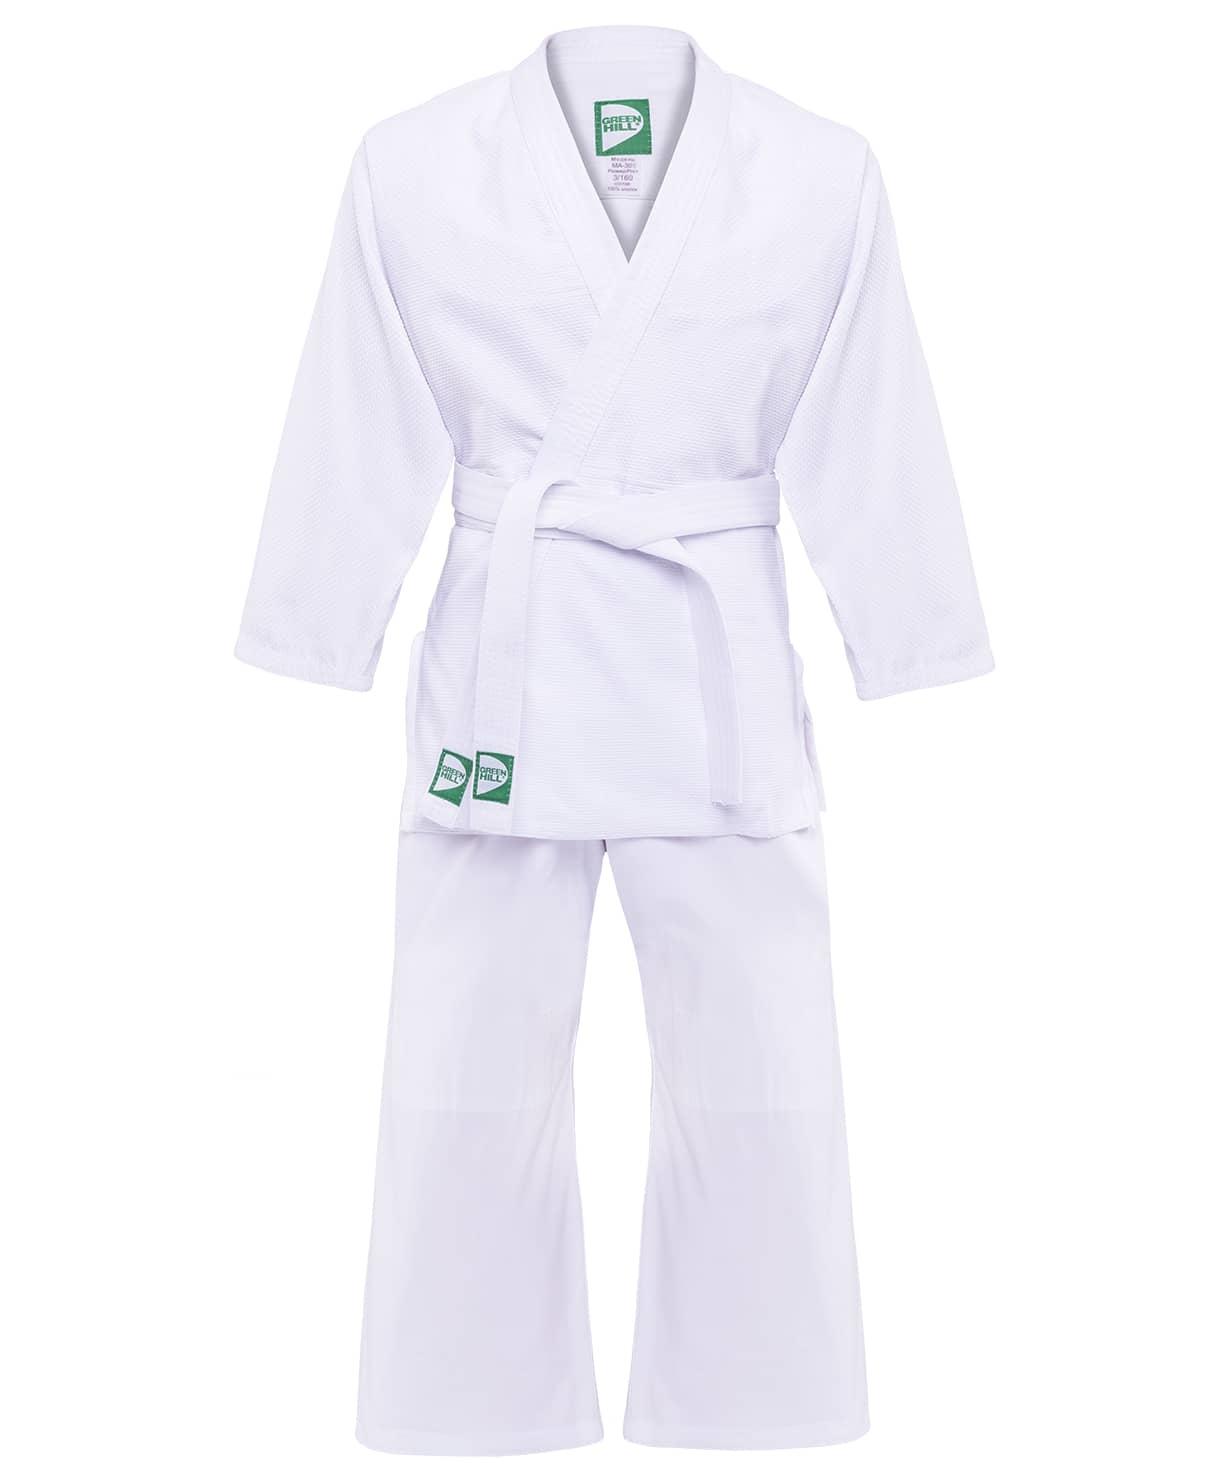 Кимоно для дзюдо MA-302 белый, р.2/150